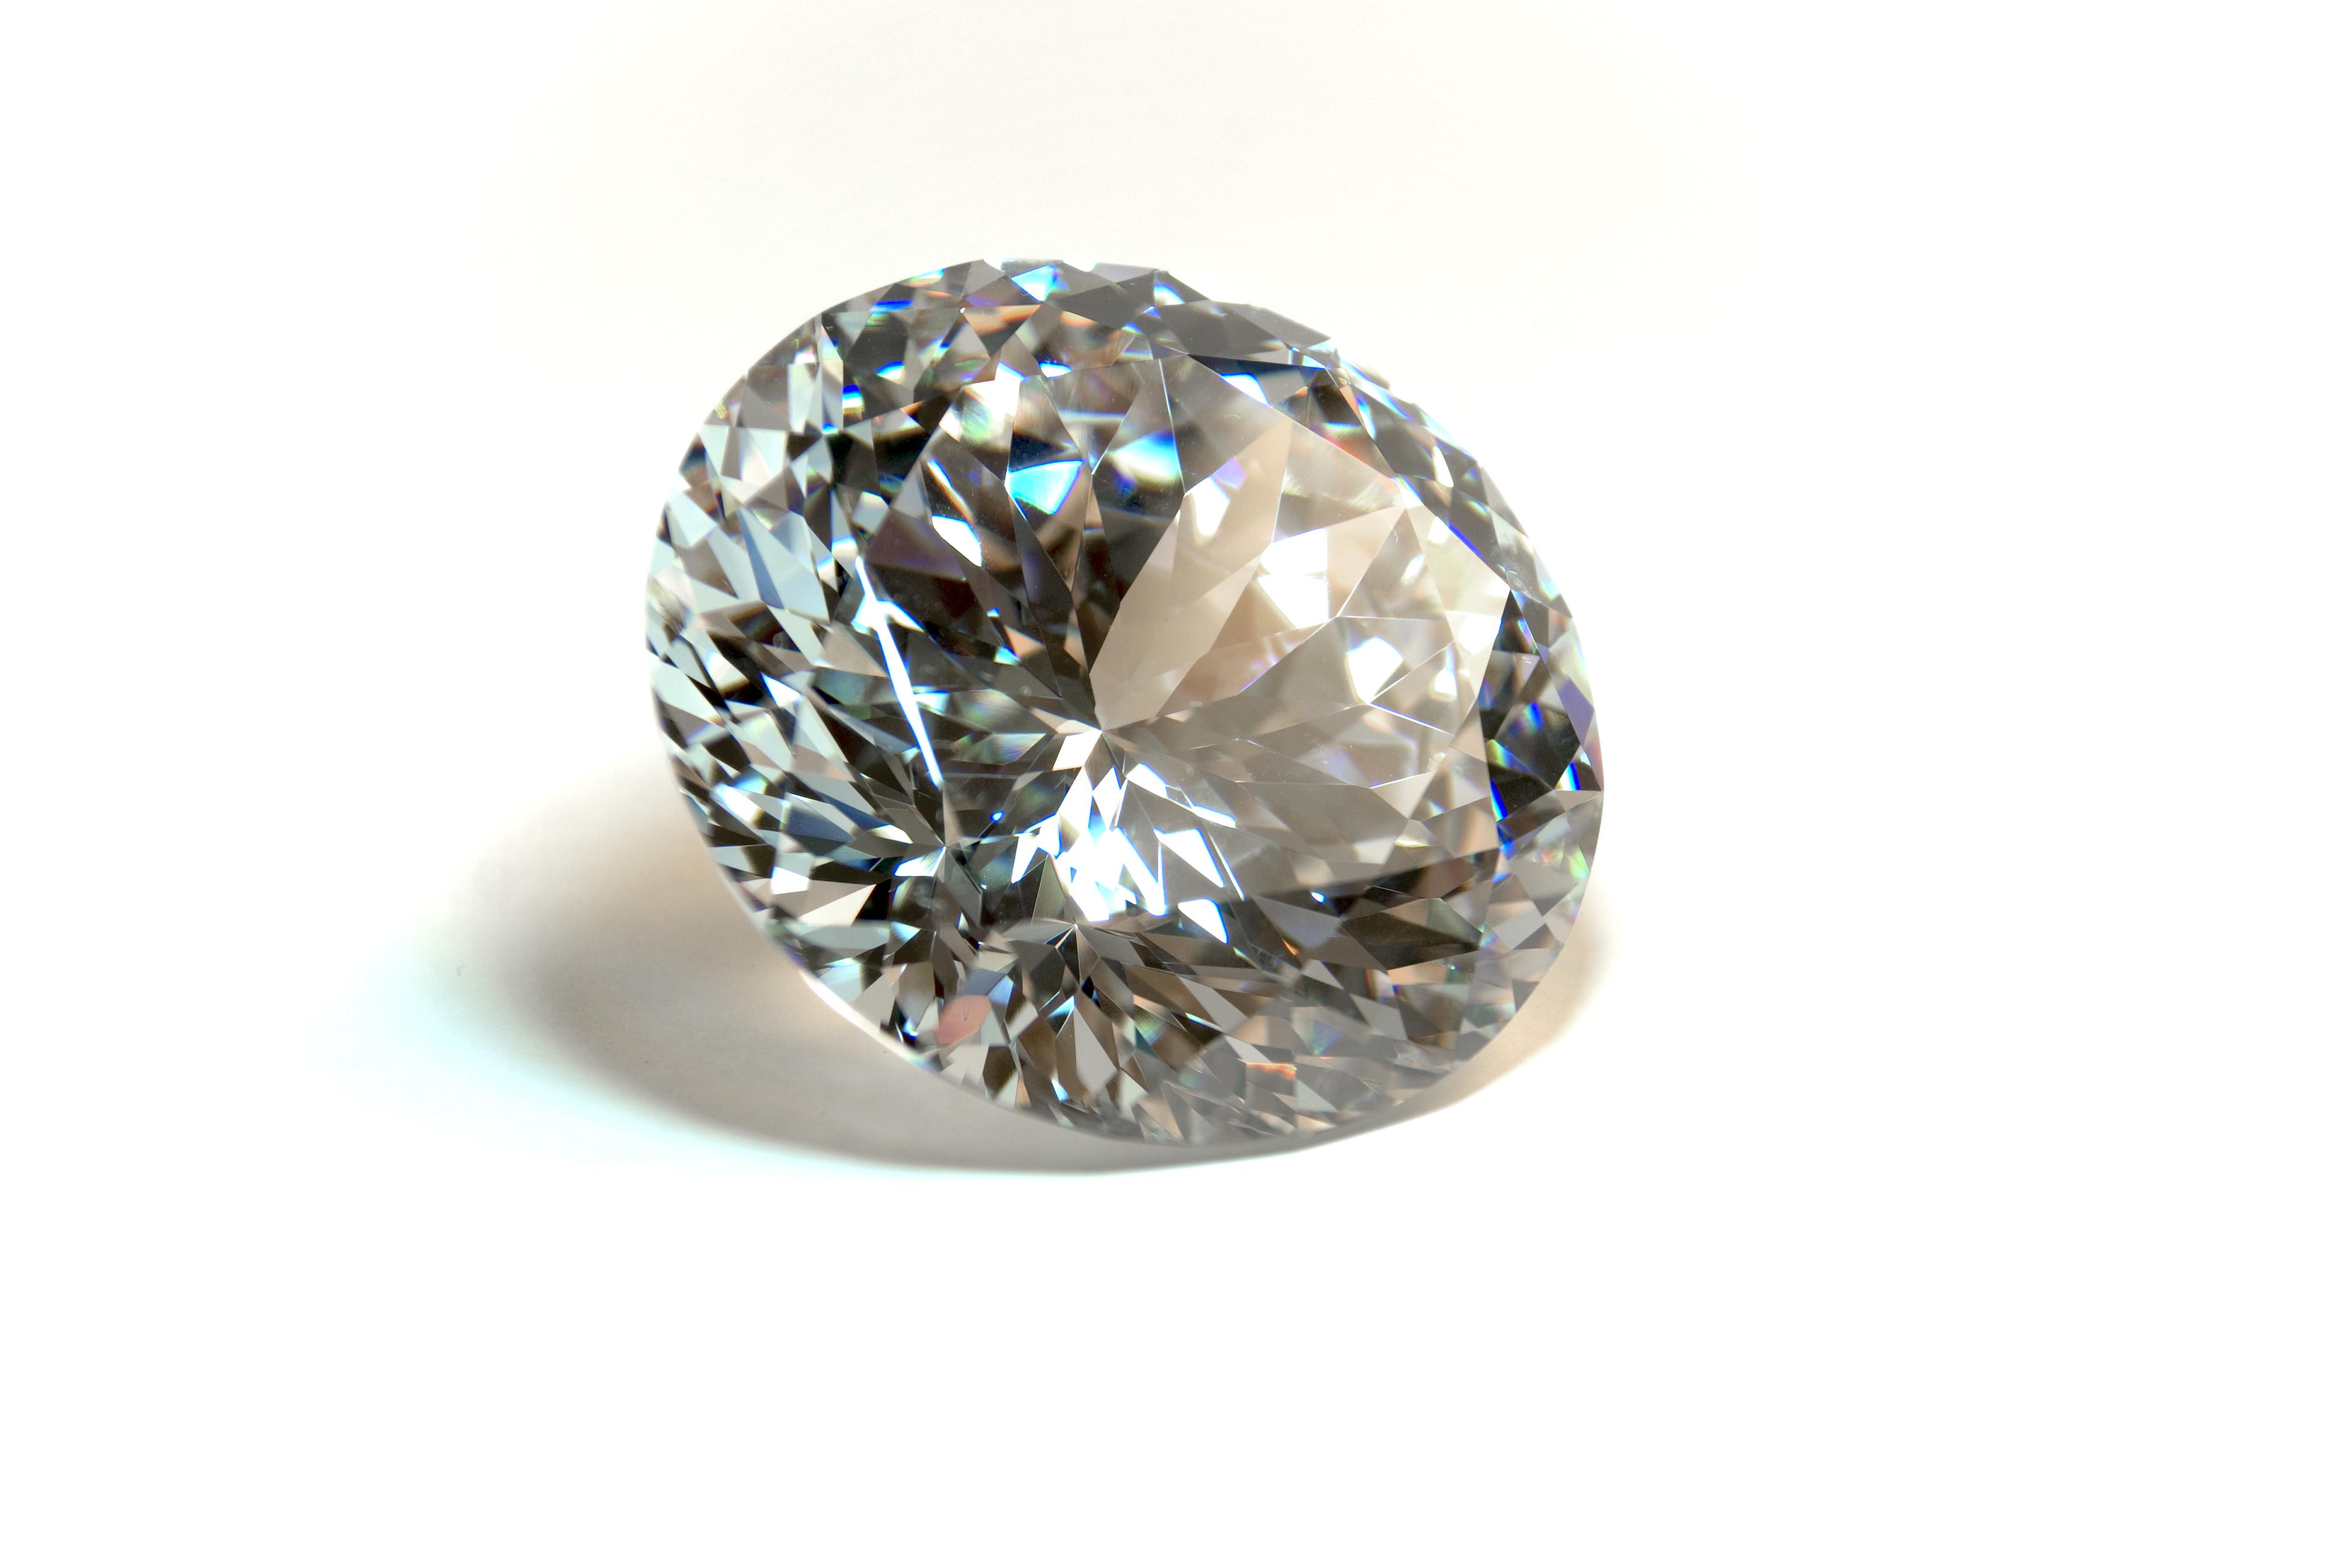 Diamond Photo Courtesy Morguefile Free Section